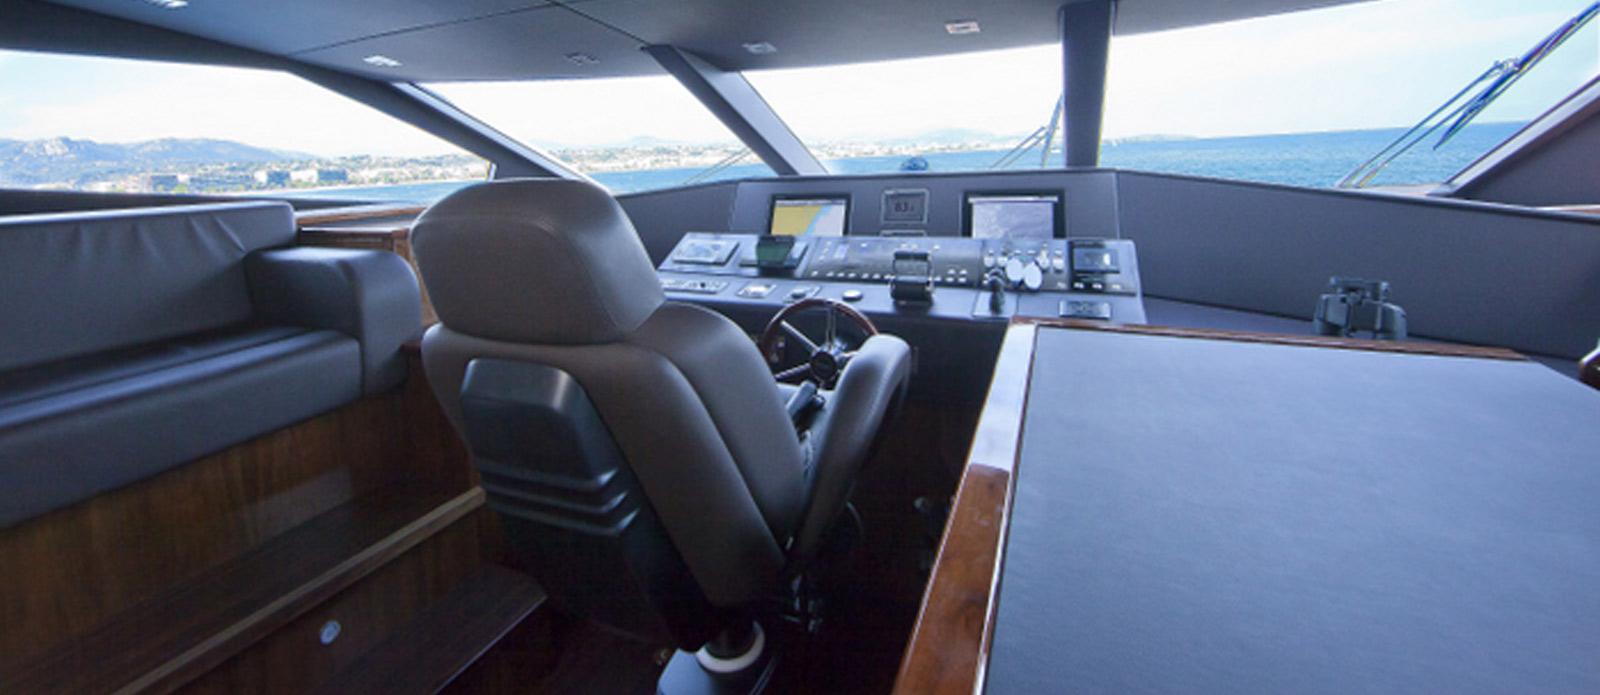 Sunseeker-30-Metre-Yacht-Tuppence-Sunseeker-30-Metre-Yacht-Tuppence-Wheelhouse